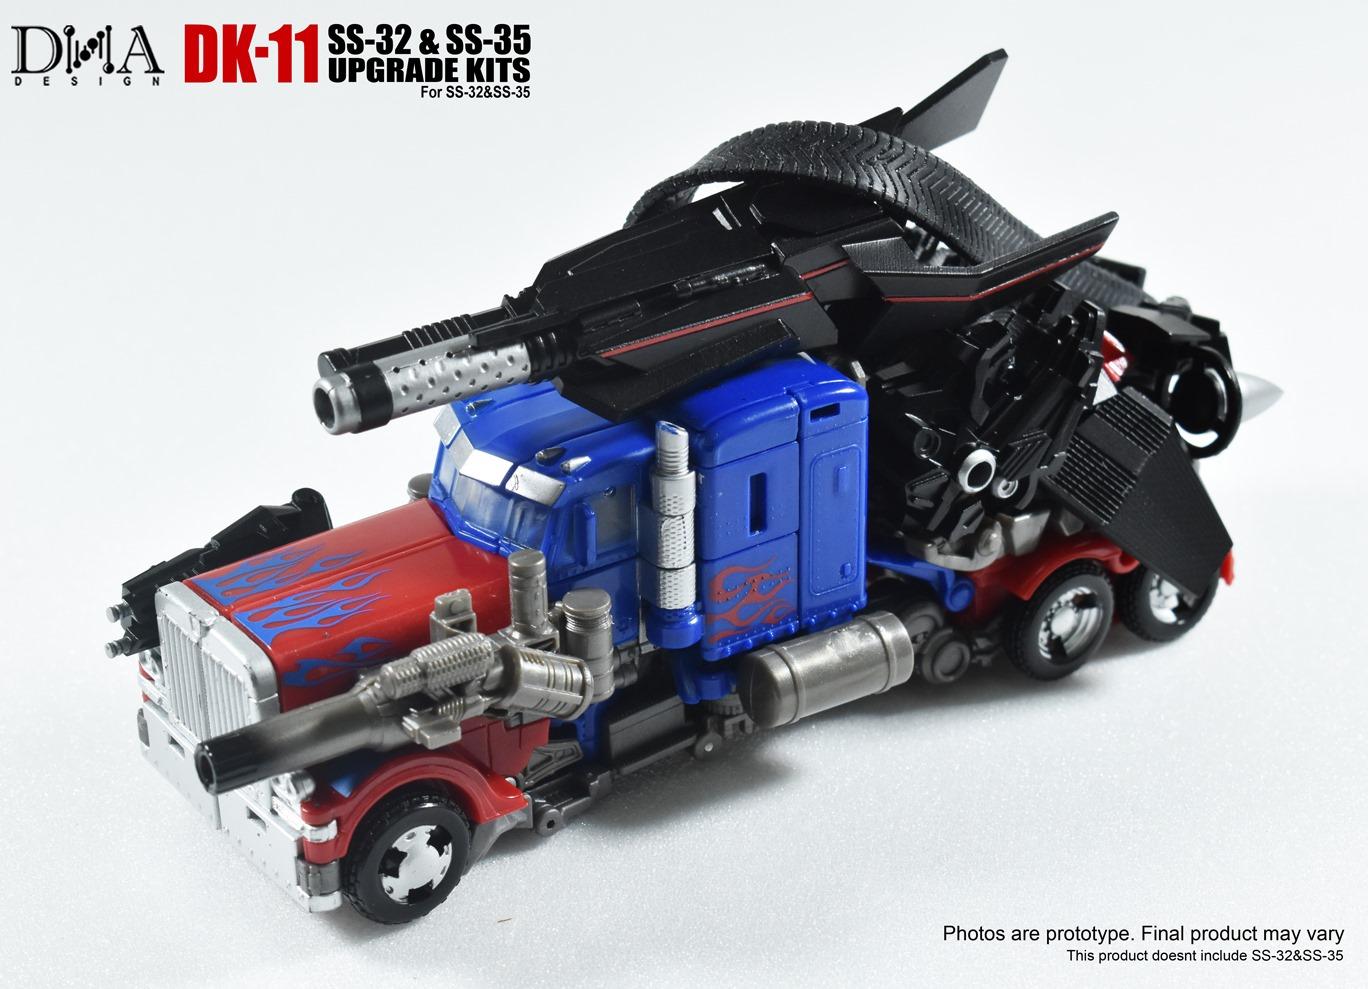 New DNA Design DK-11 Upgrade Kit Apply Studio Series SS-32 SS-35 transformers